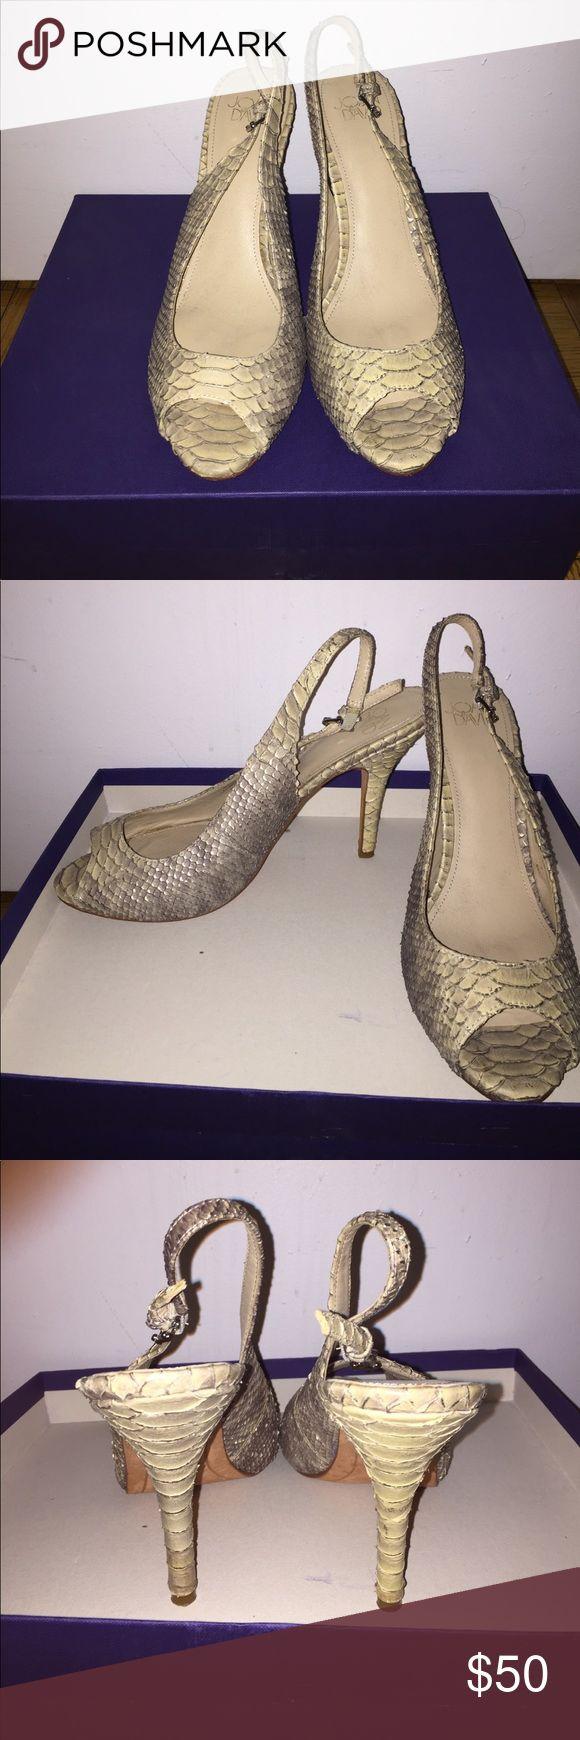 Joan & David faux snake skin peep toe sling backs Lightly worn Joan & David faux snake skin sling backs Joan & David Shoes Heels